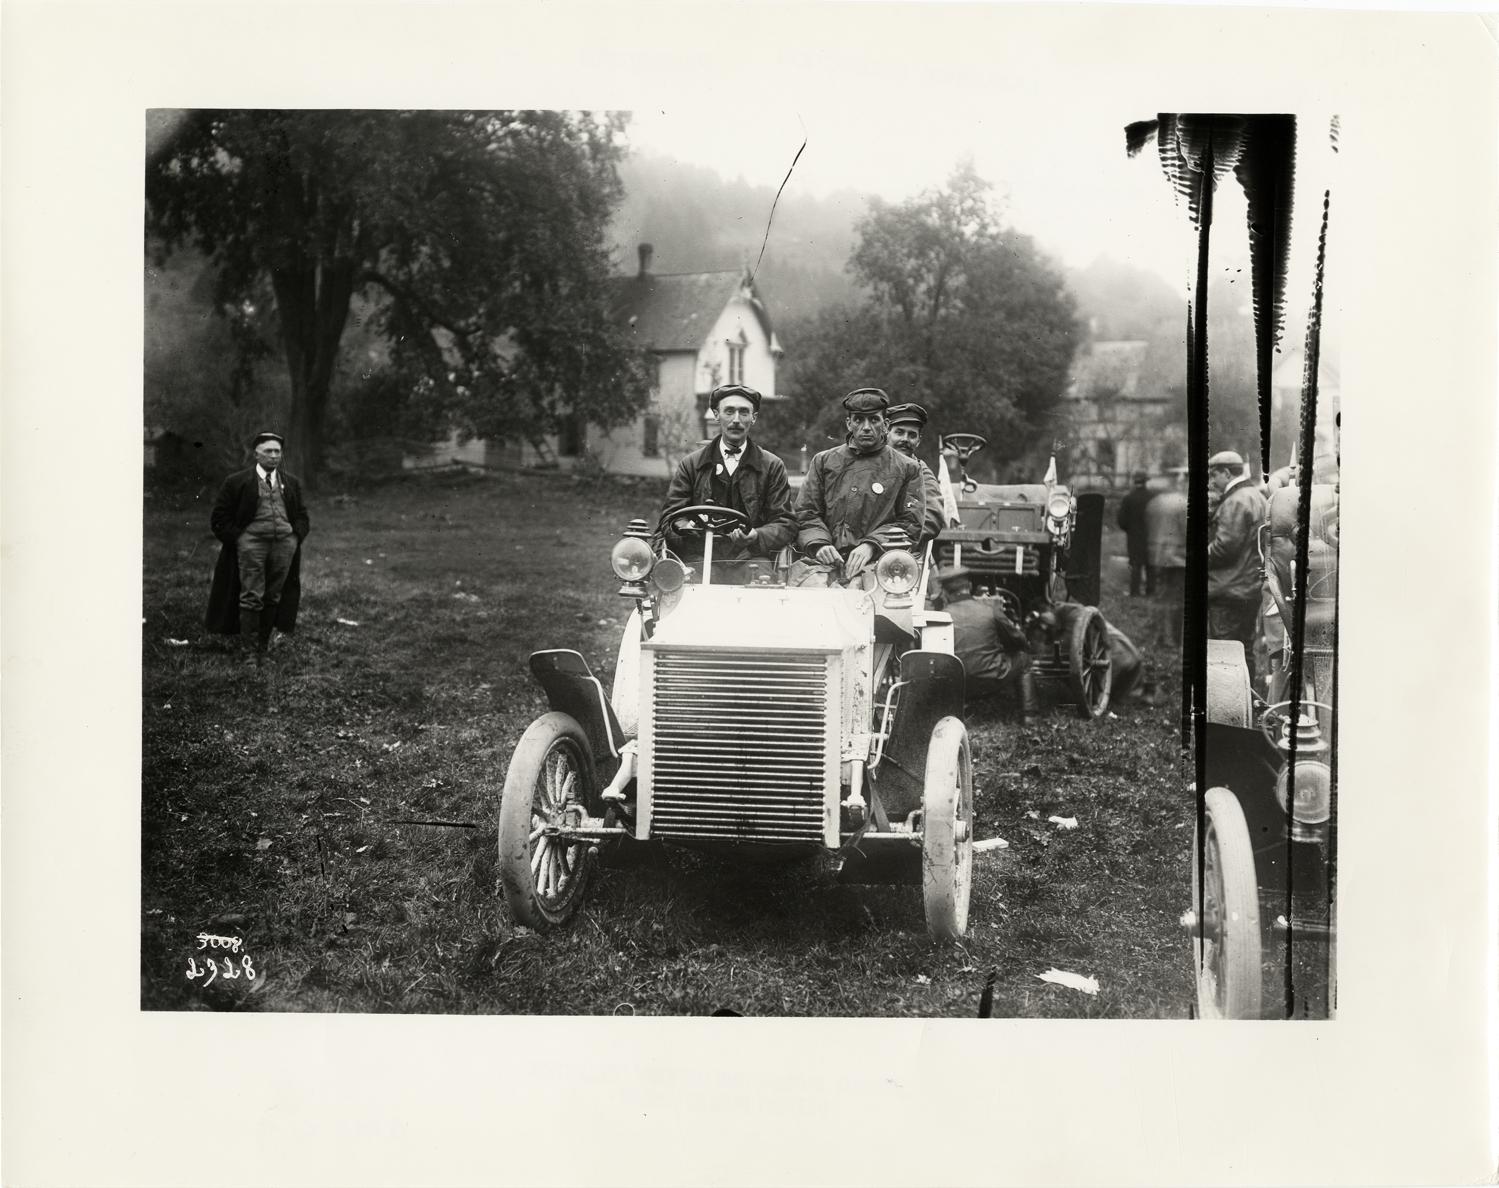 White Steamer at Pine Hill, 1903